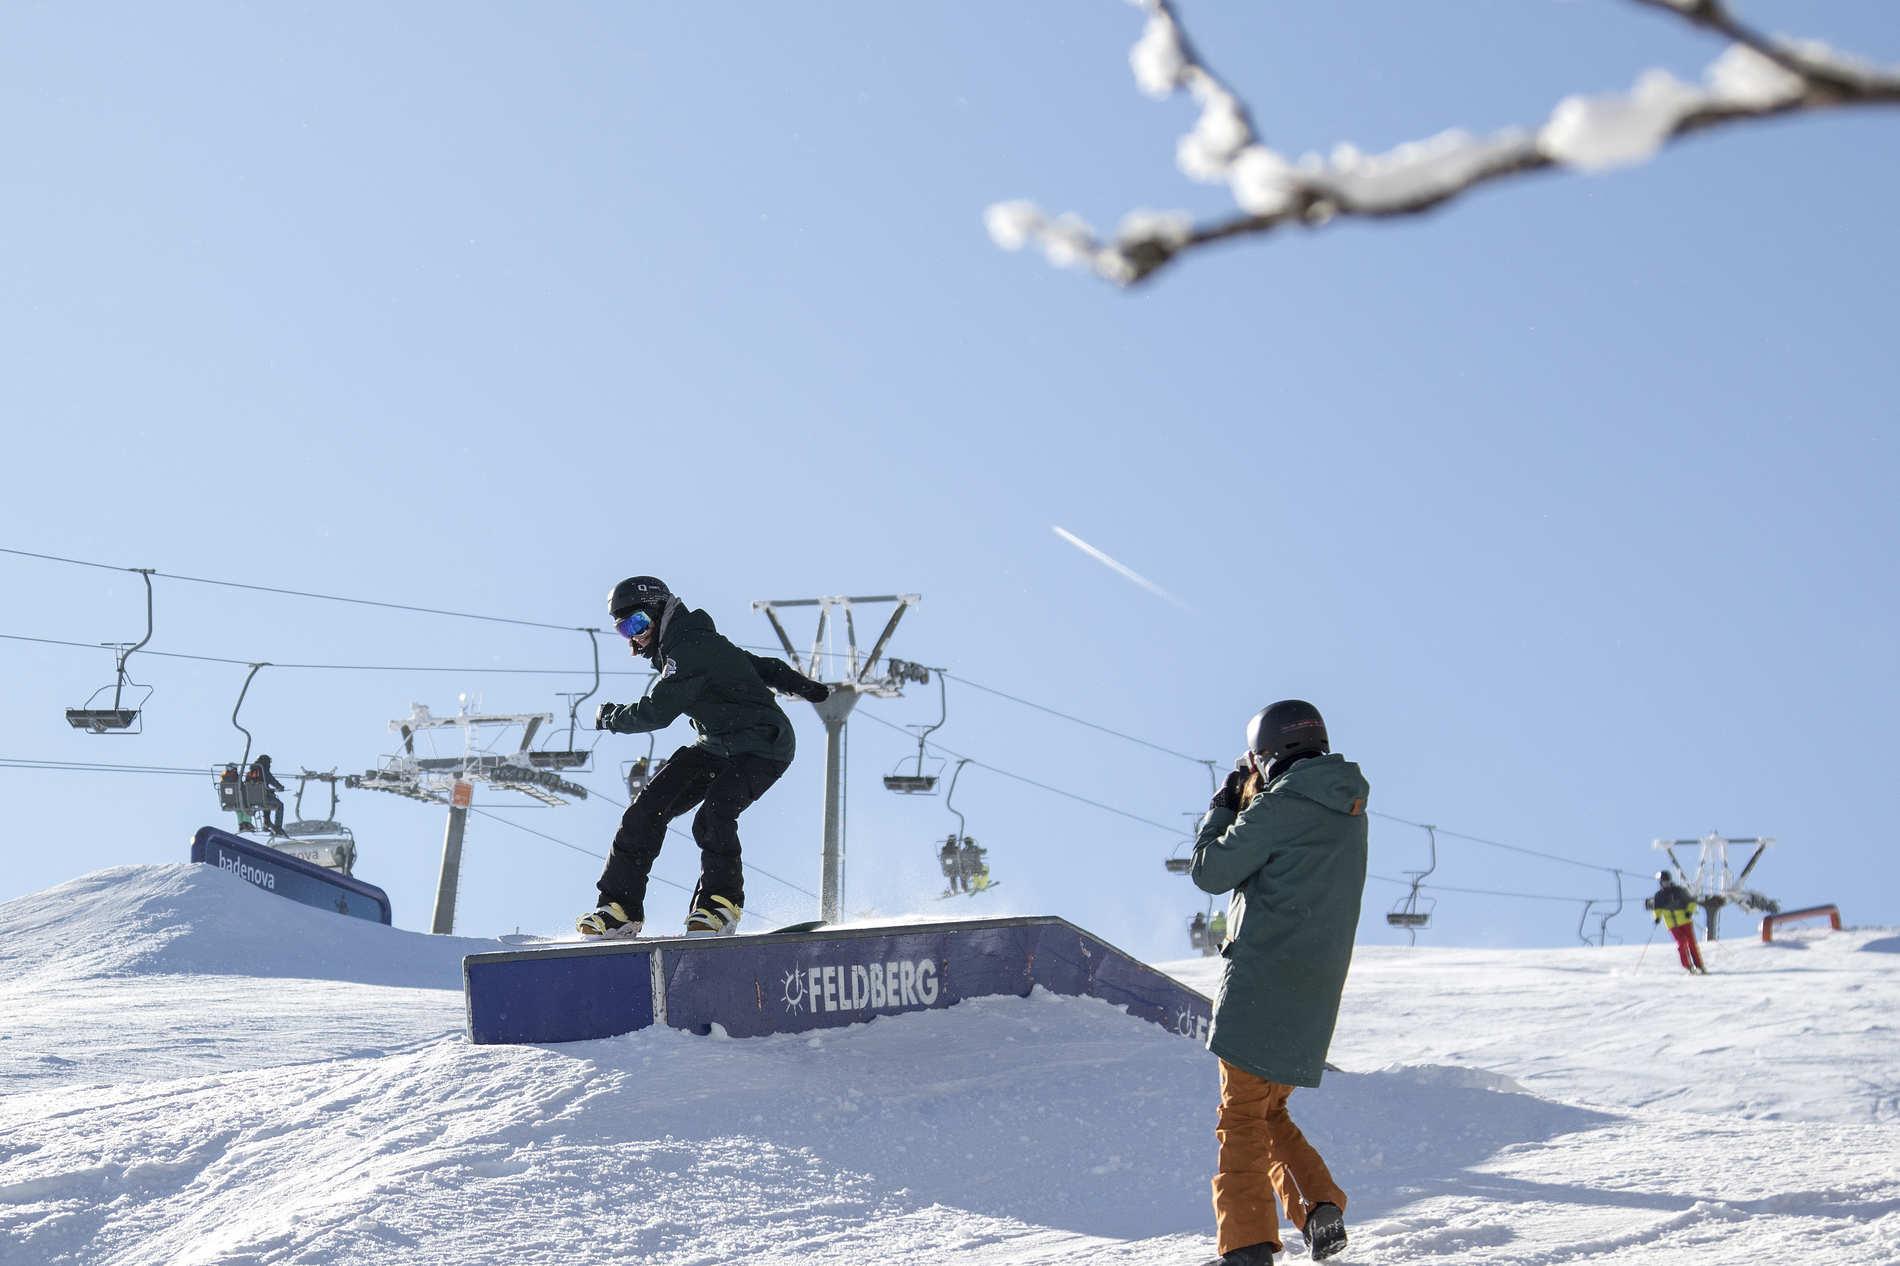 snowpark feldberg 24 02 2018 action sb alex martin herrmann qparks 12